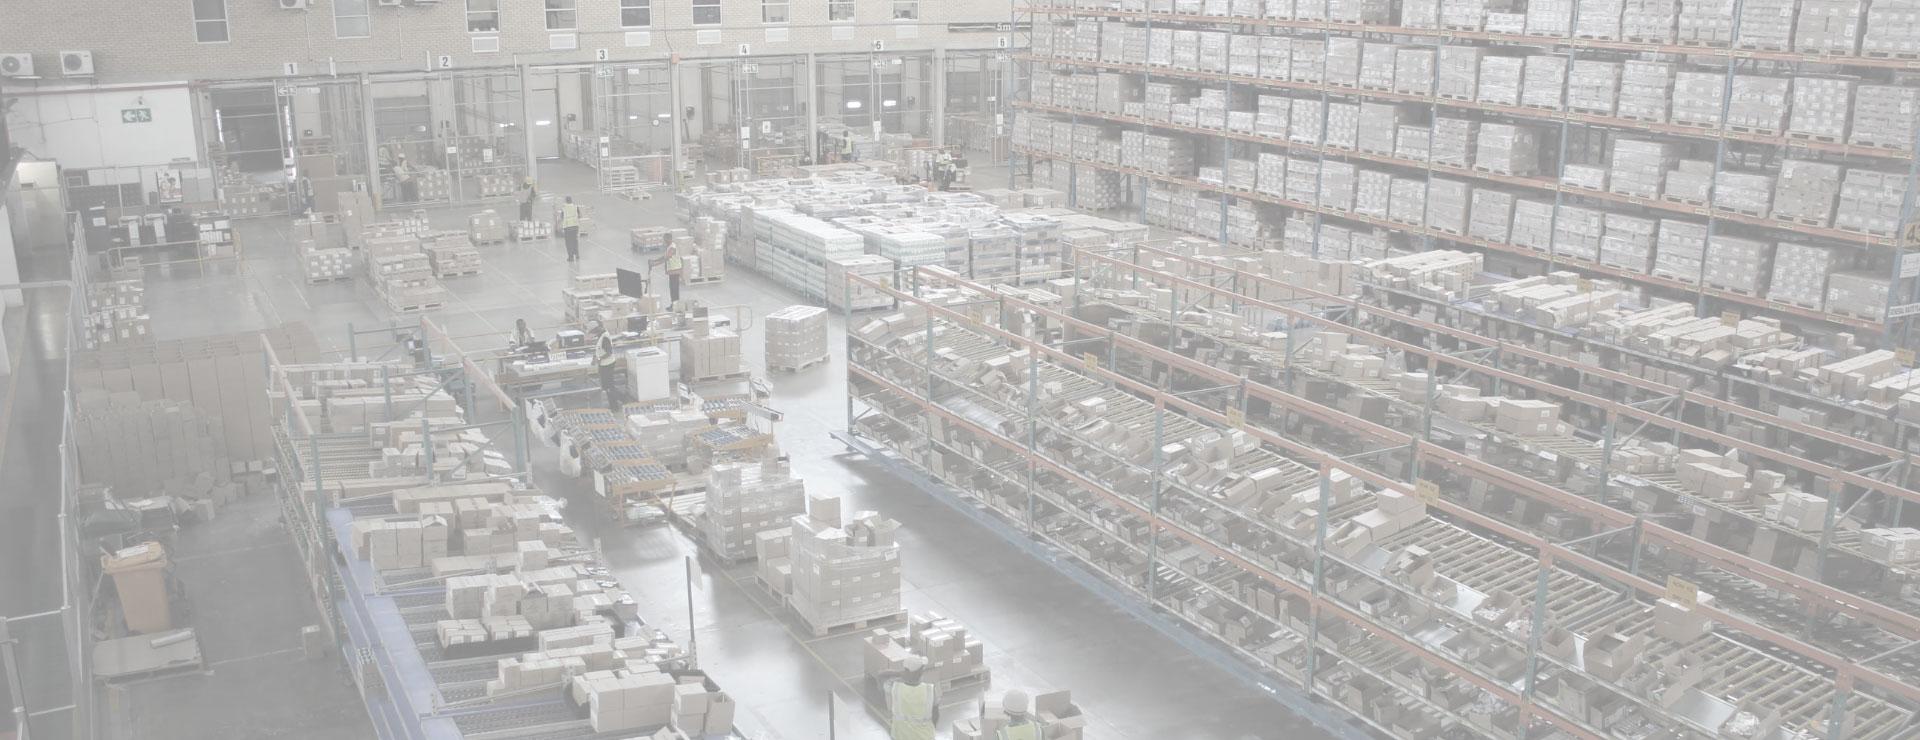 default warehouse image